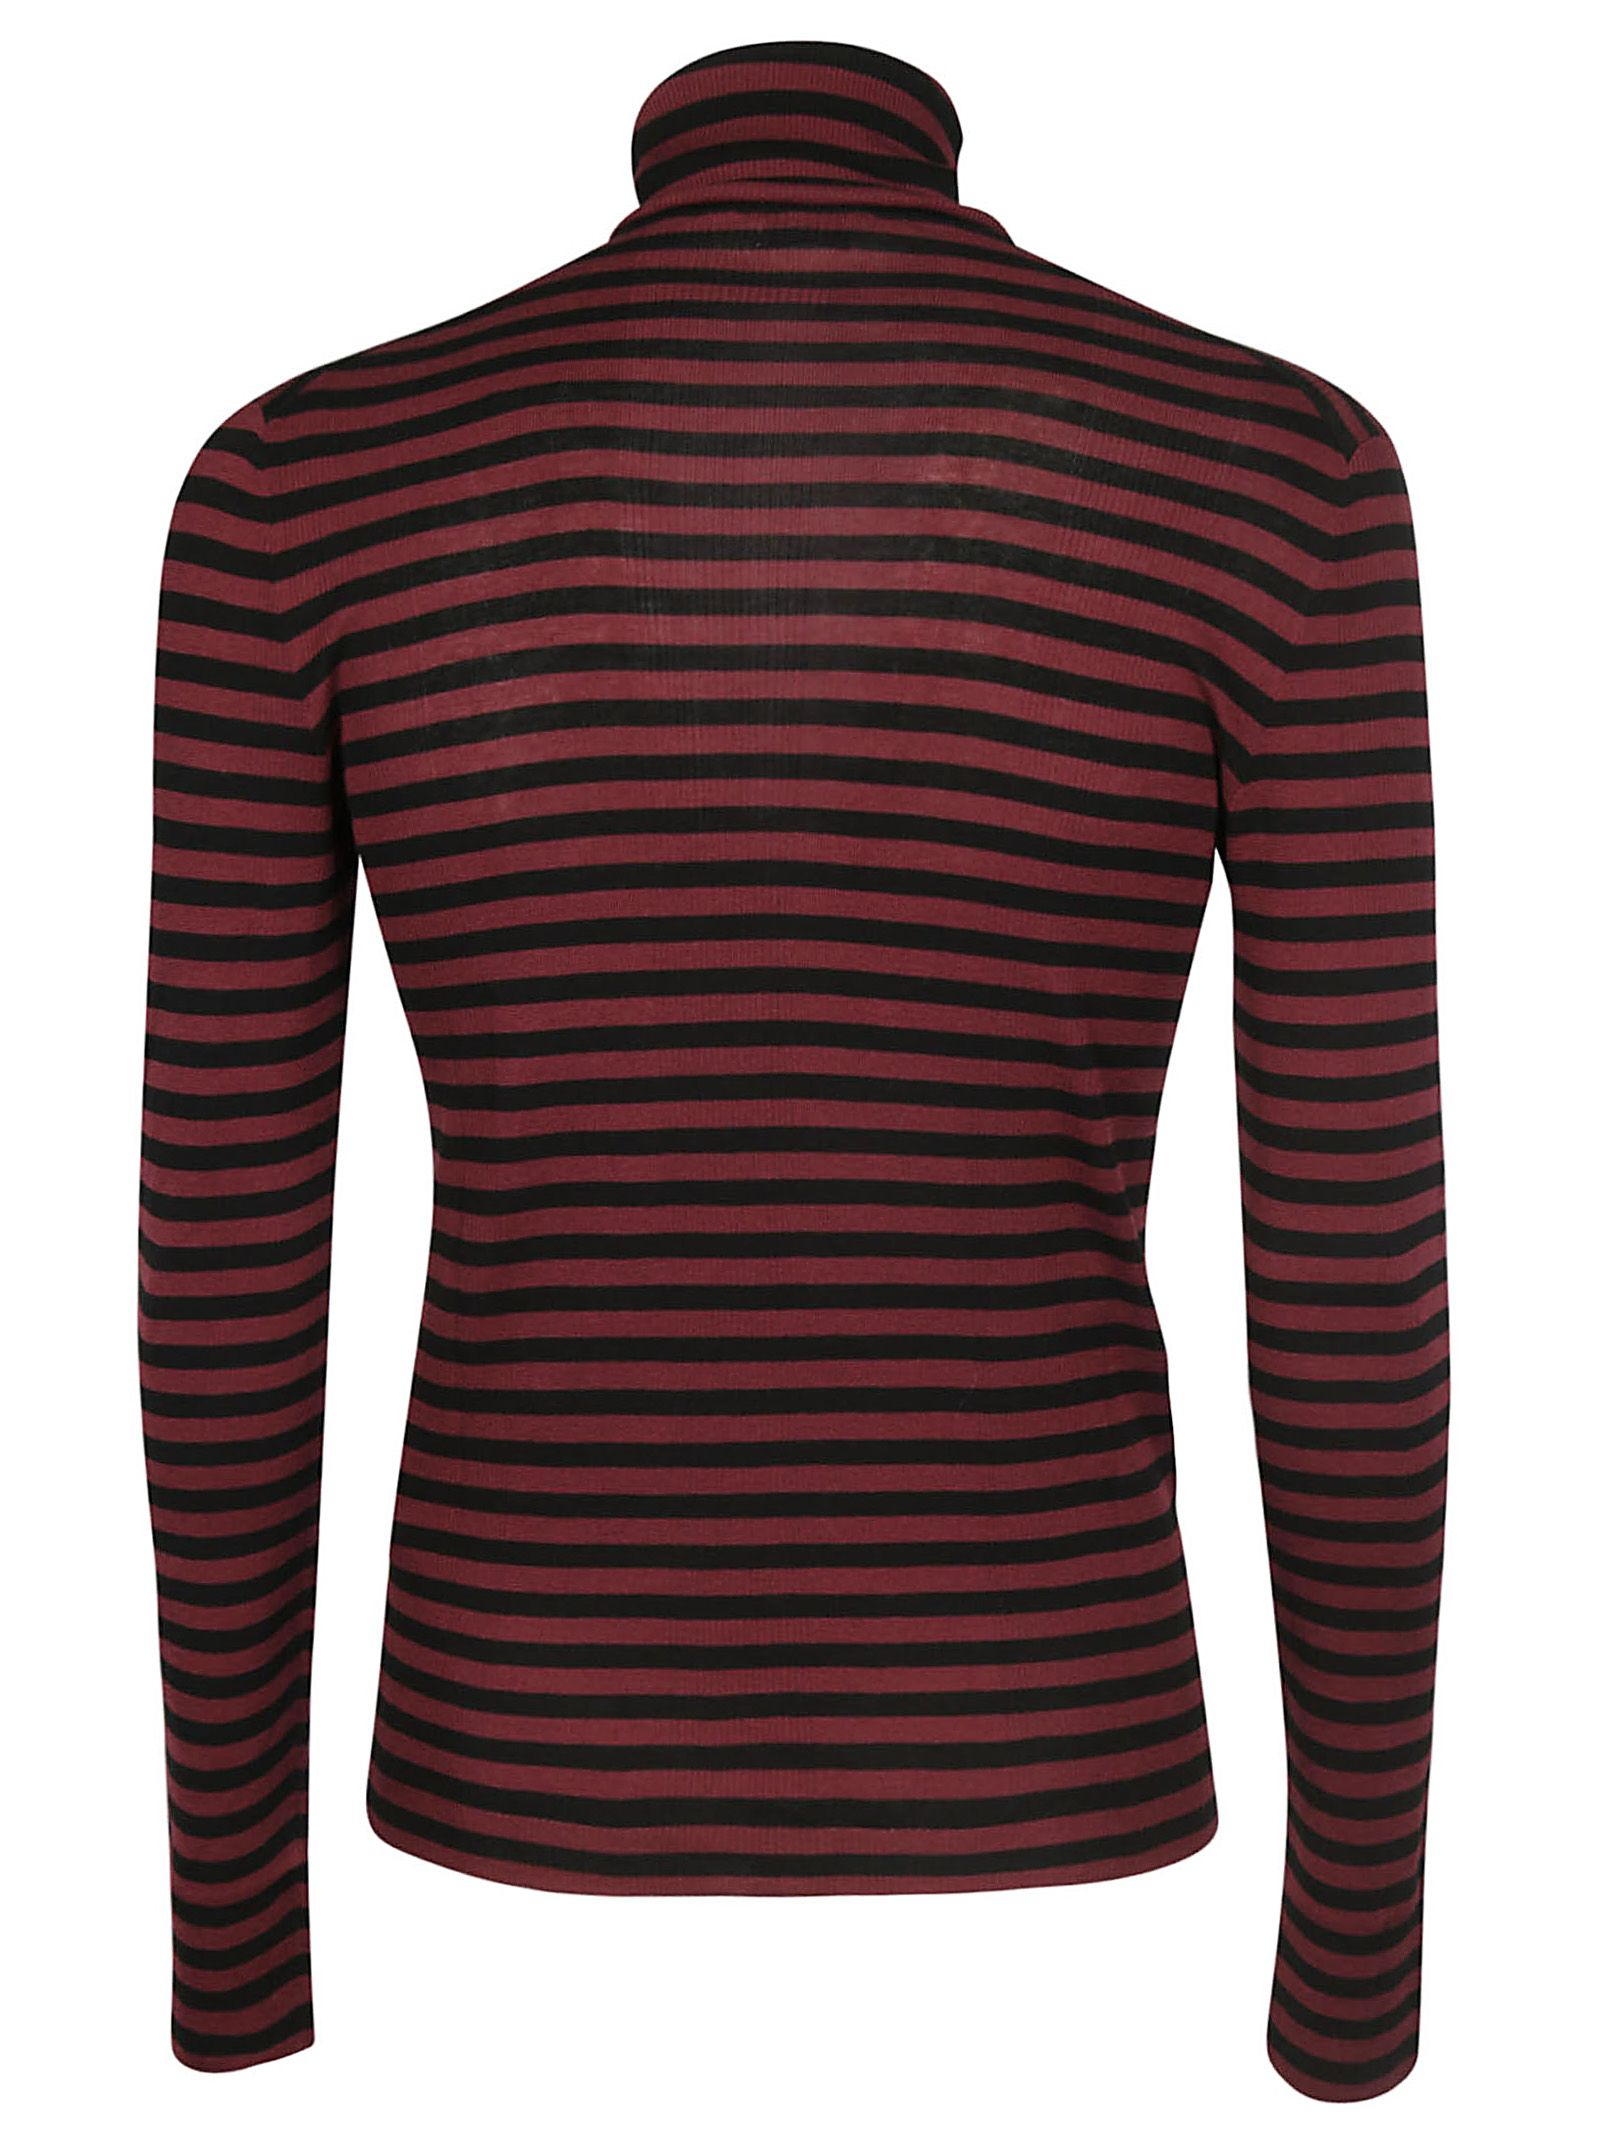 495c9b79463f Saint Laurent Striped Sweater - Basic Saint Laurent Striped Sweater - Basic